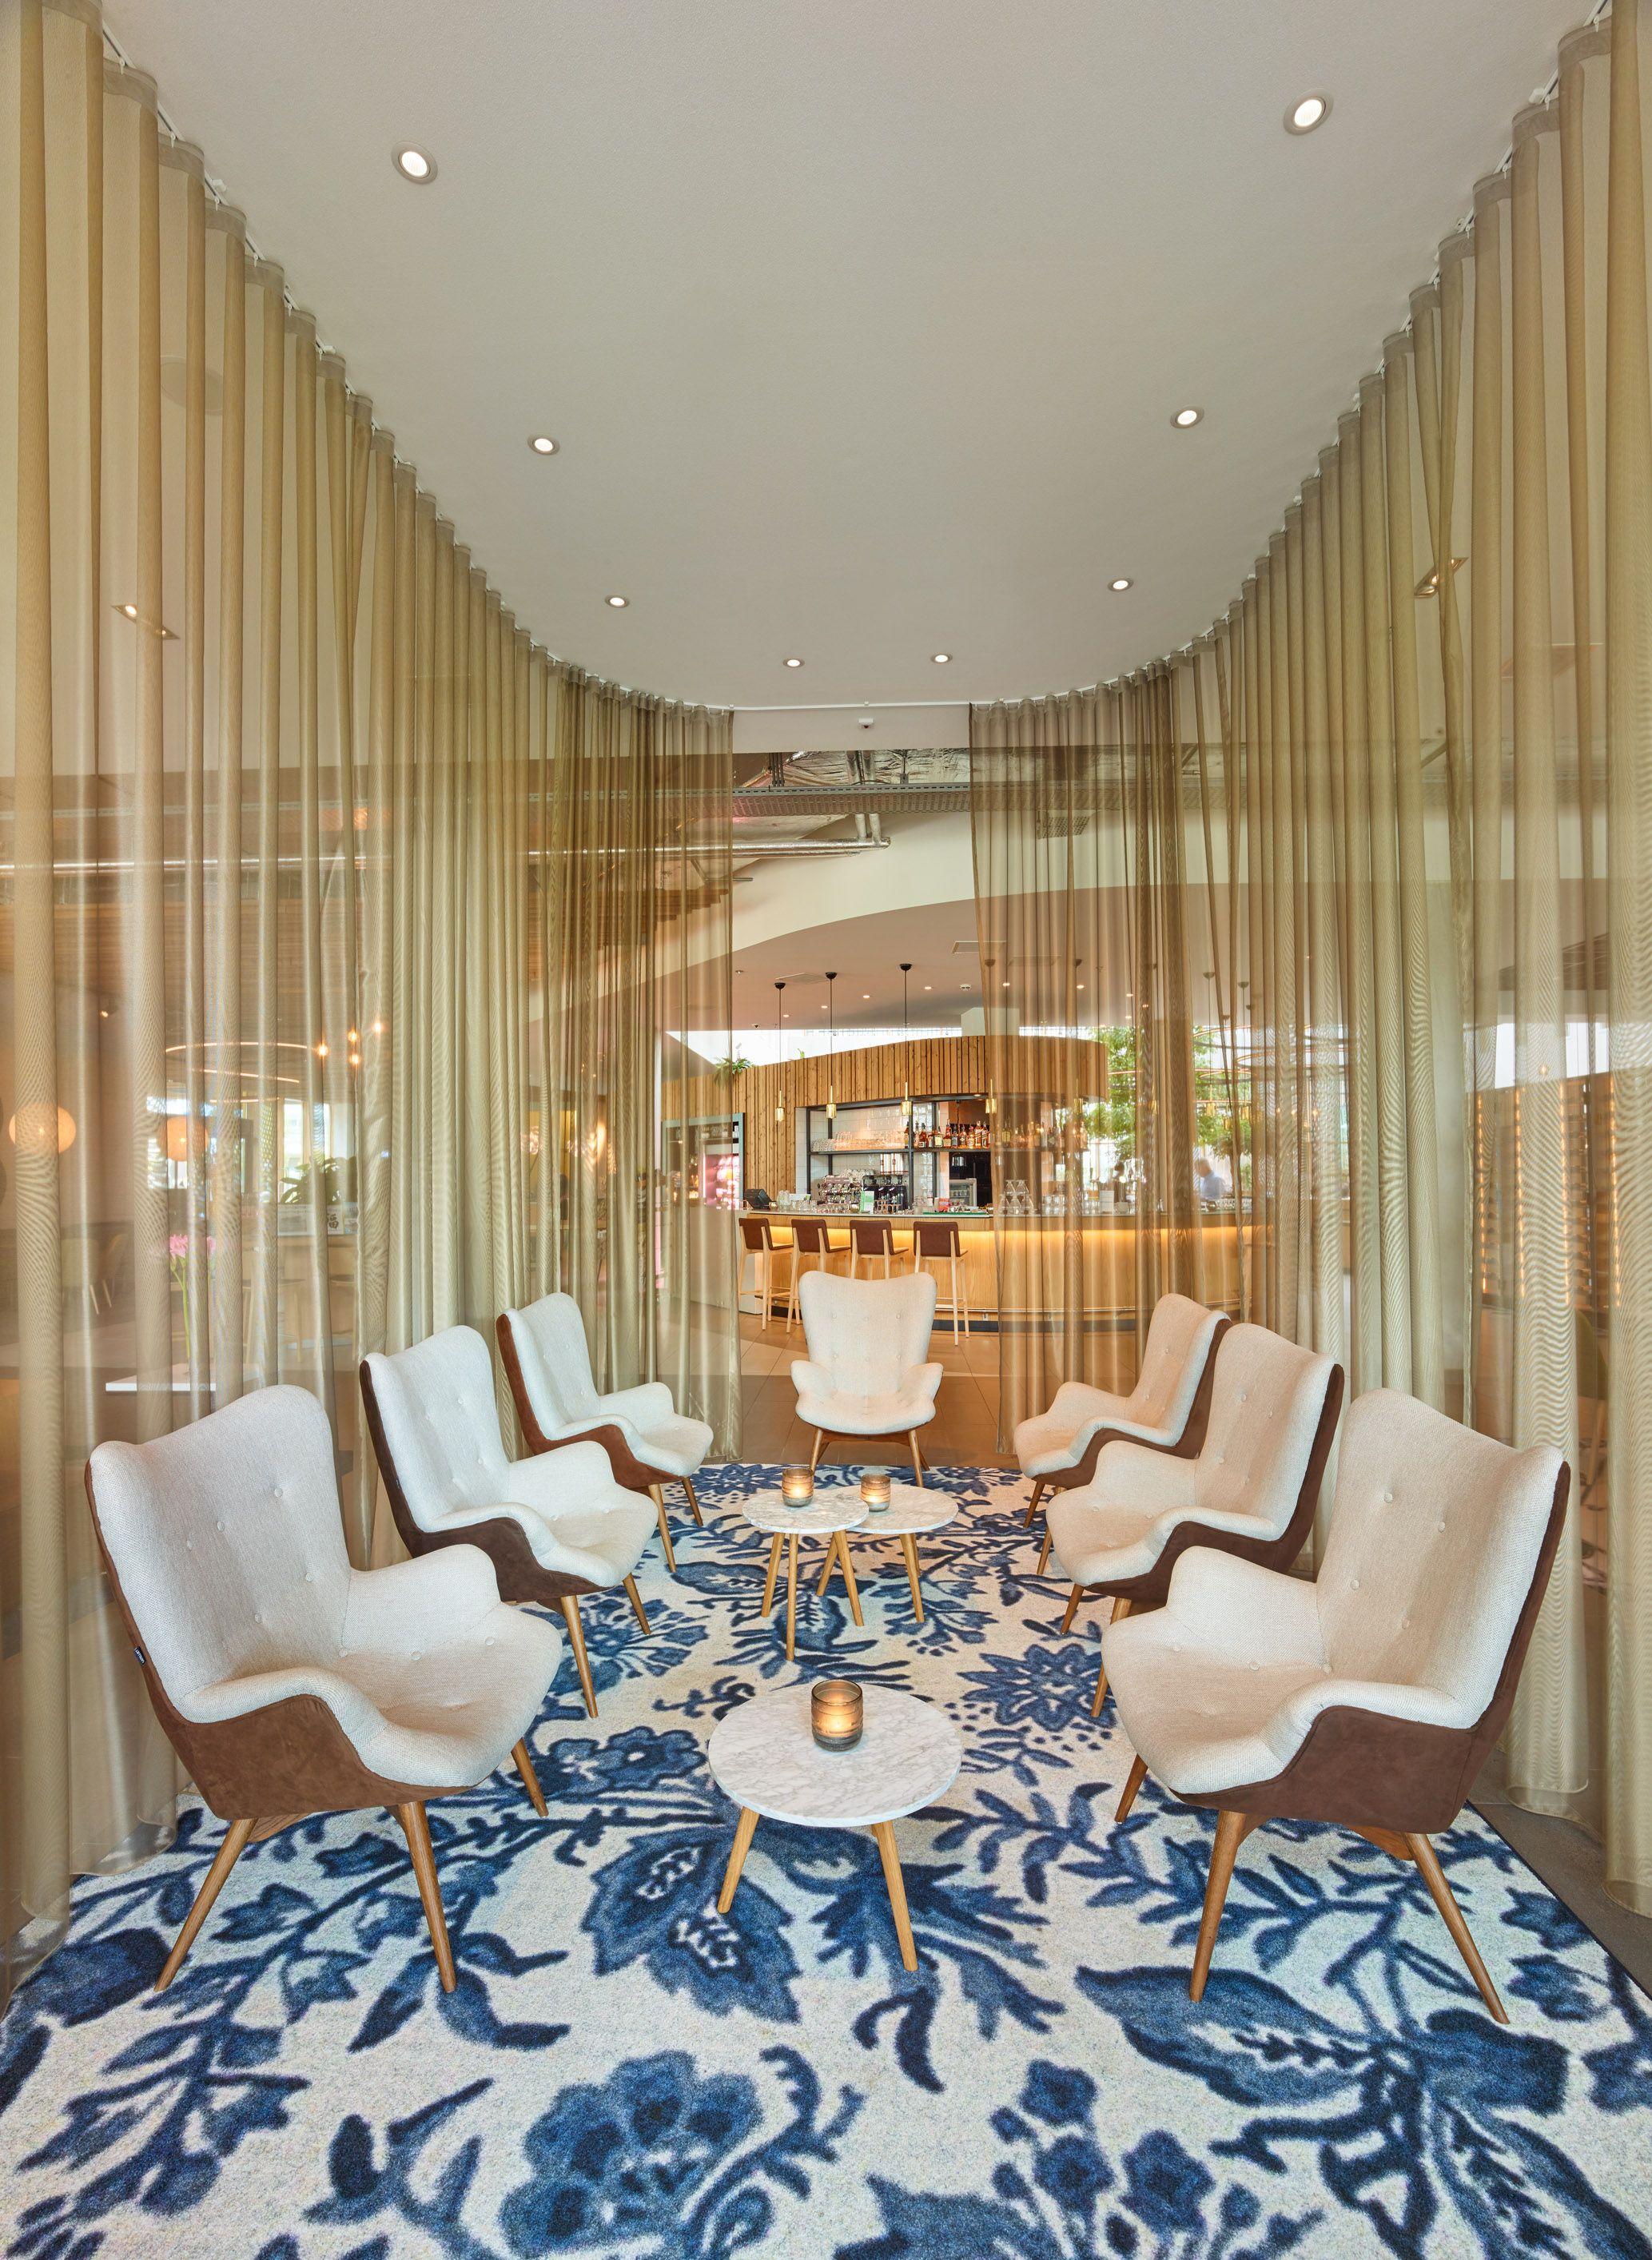 Hotel Novotel Schiphol Airport, Amsterdam.(이미지 포함)